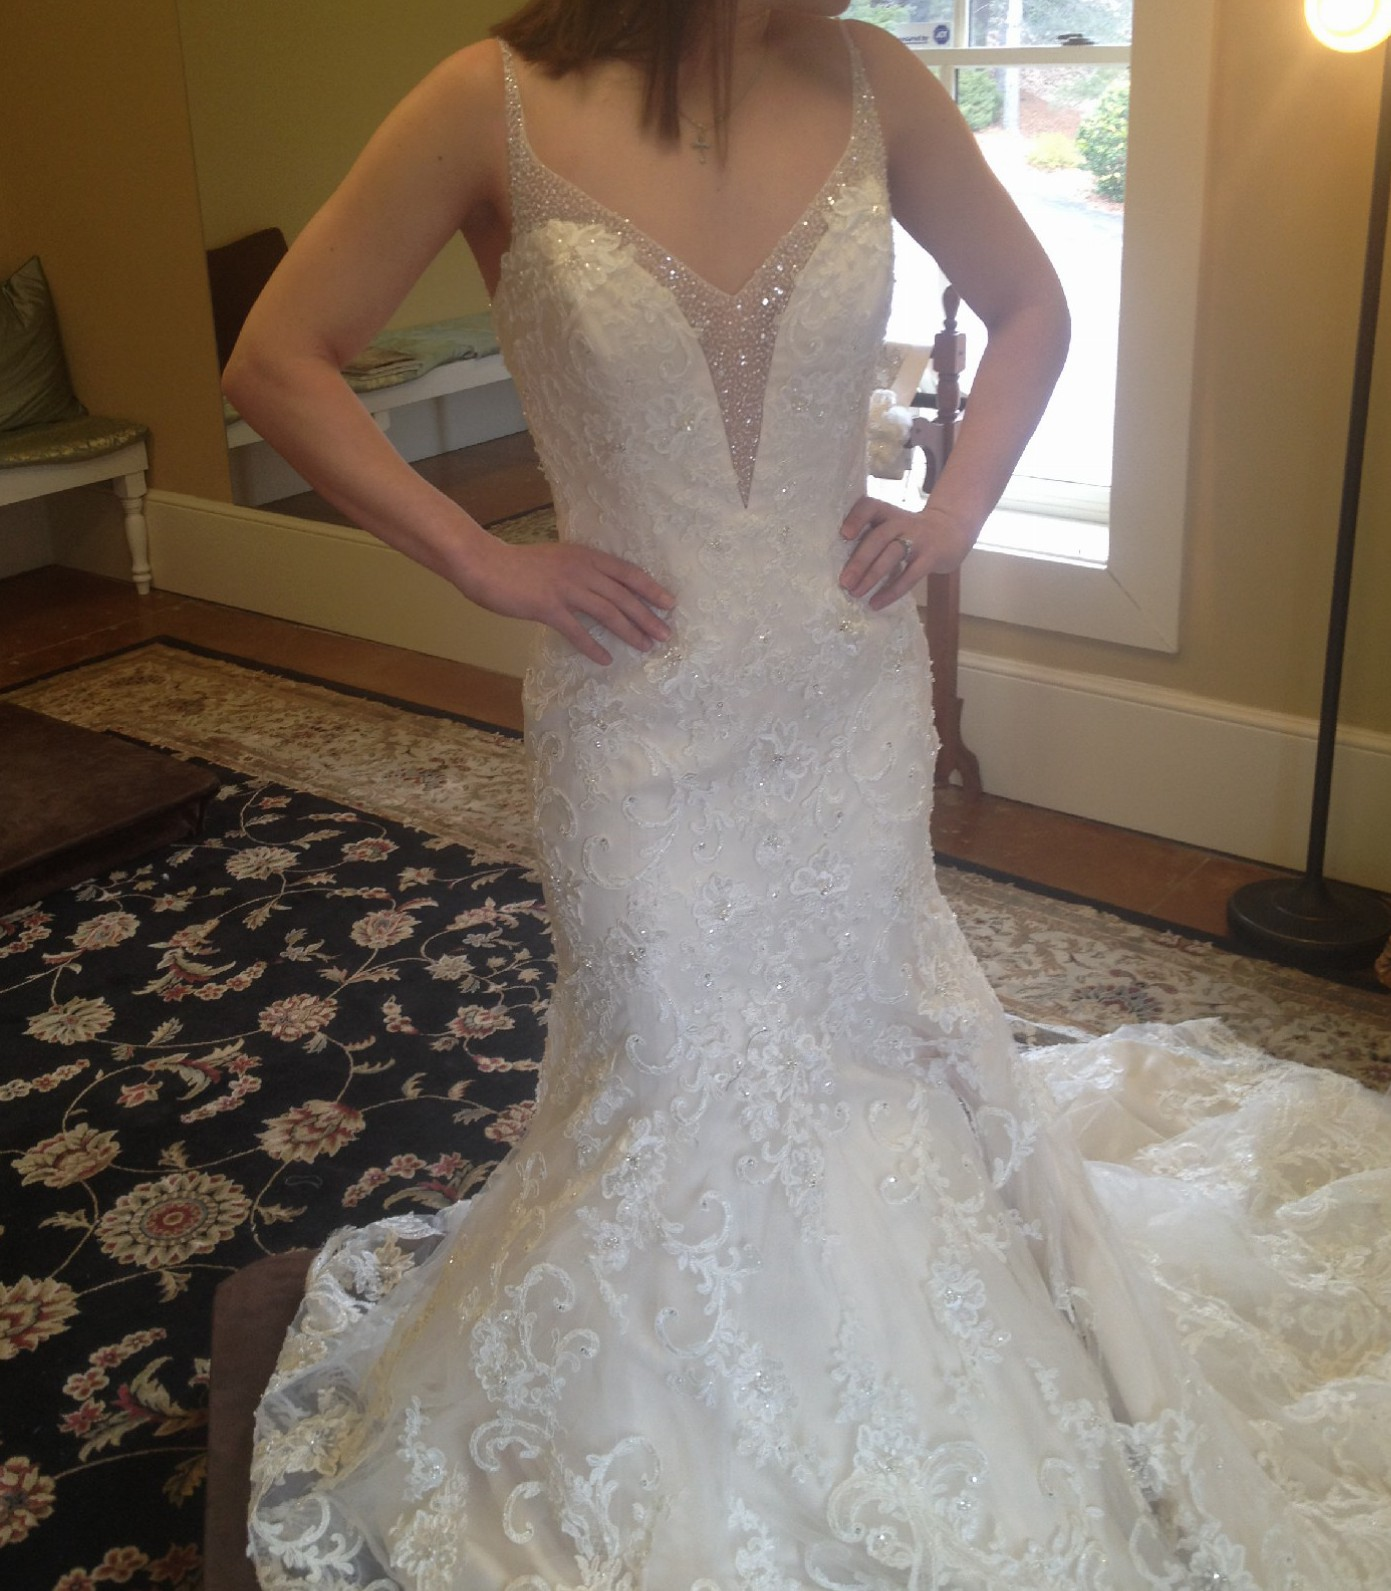 Jasmine Wedding Gowns: Jasmine Couture T172013 New Wedding Dress On Sale 55% Off